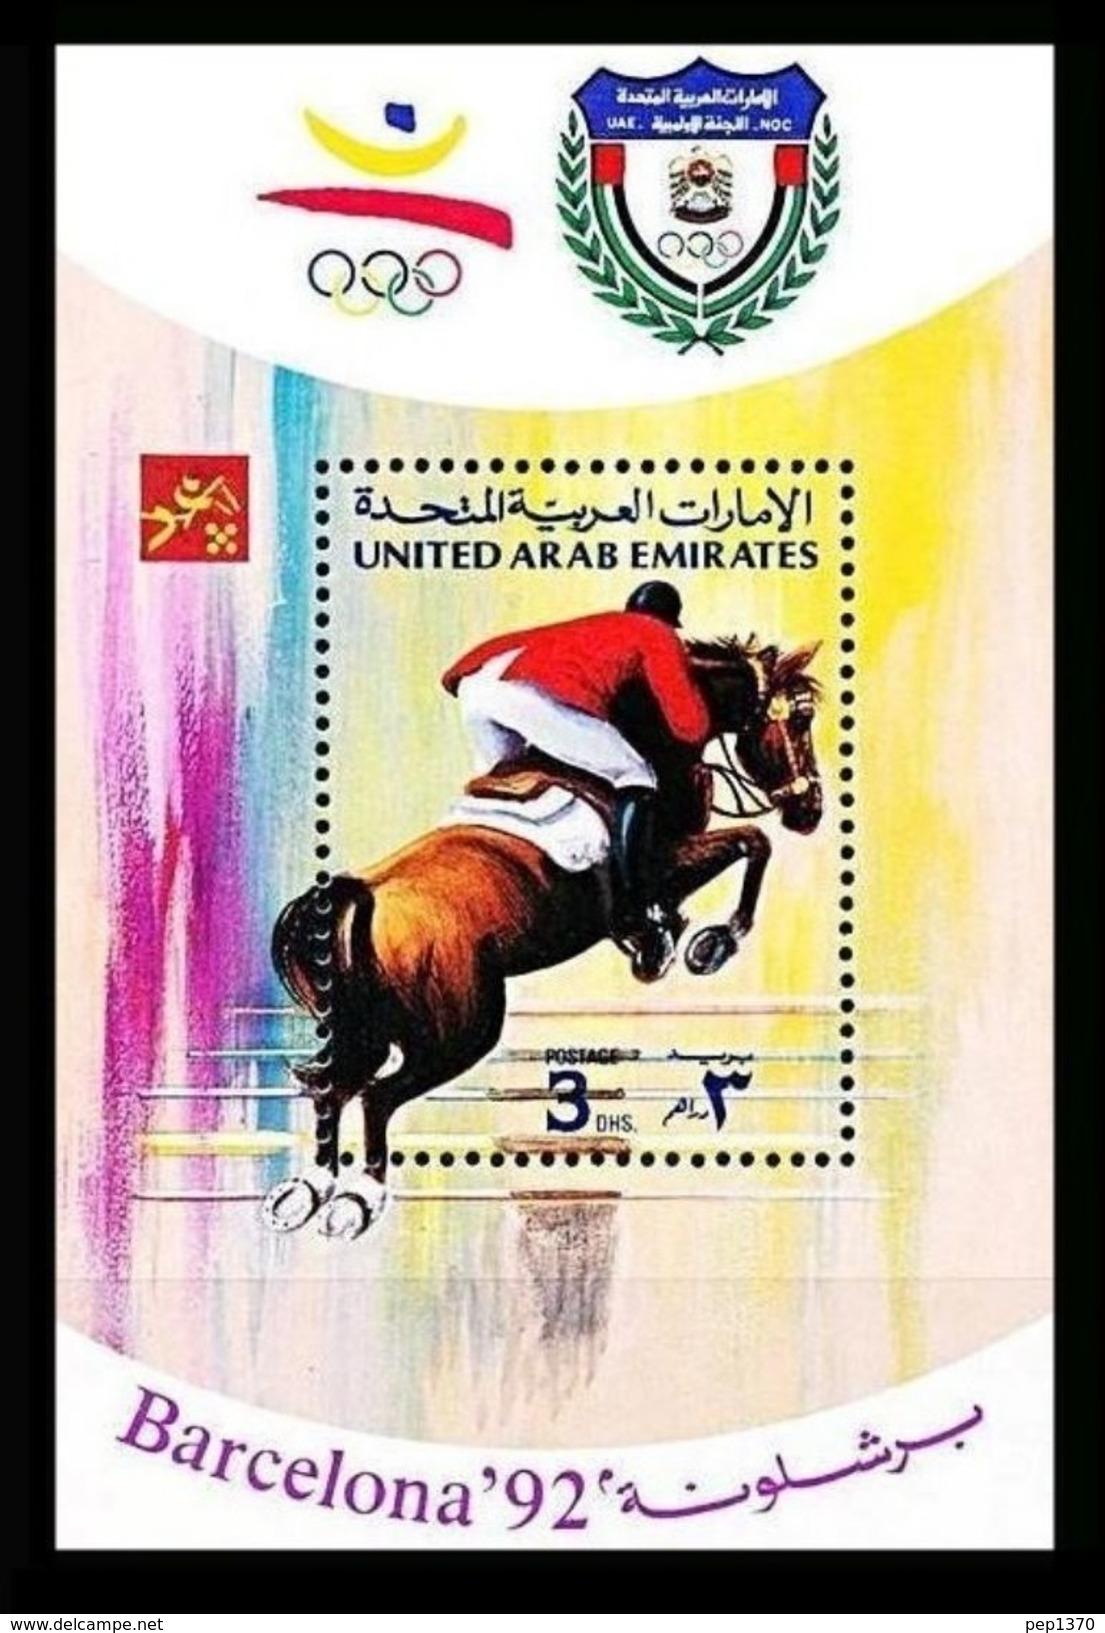 EMIRATOS ARABES UNIDOS 1992 - UNITED ARAB EMIRATES - OLYMPICS BARCELONA 92 - YVERT BF-12  MICHEL BLOCK 11  SCOTT SS 390A - Ver. Arab. Emirate